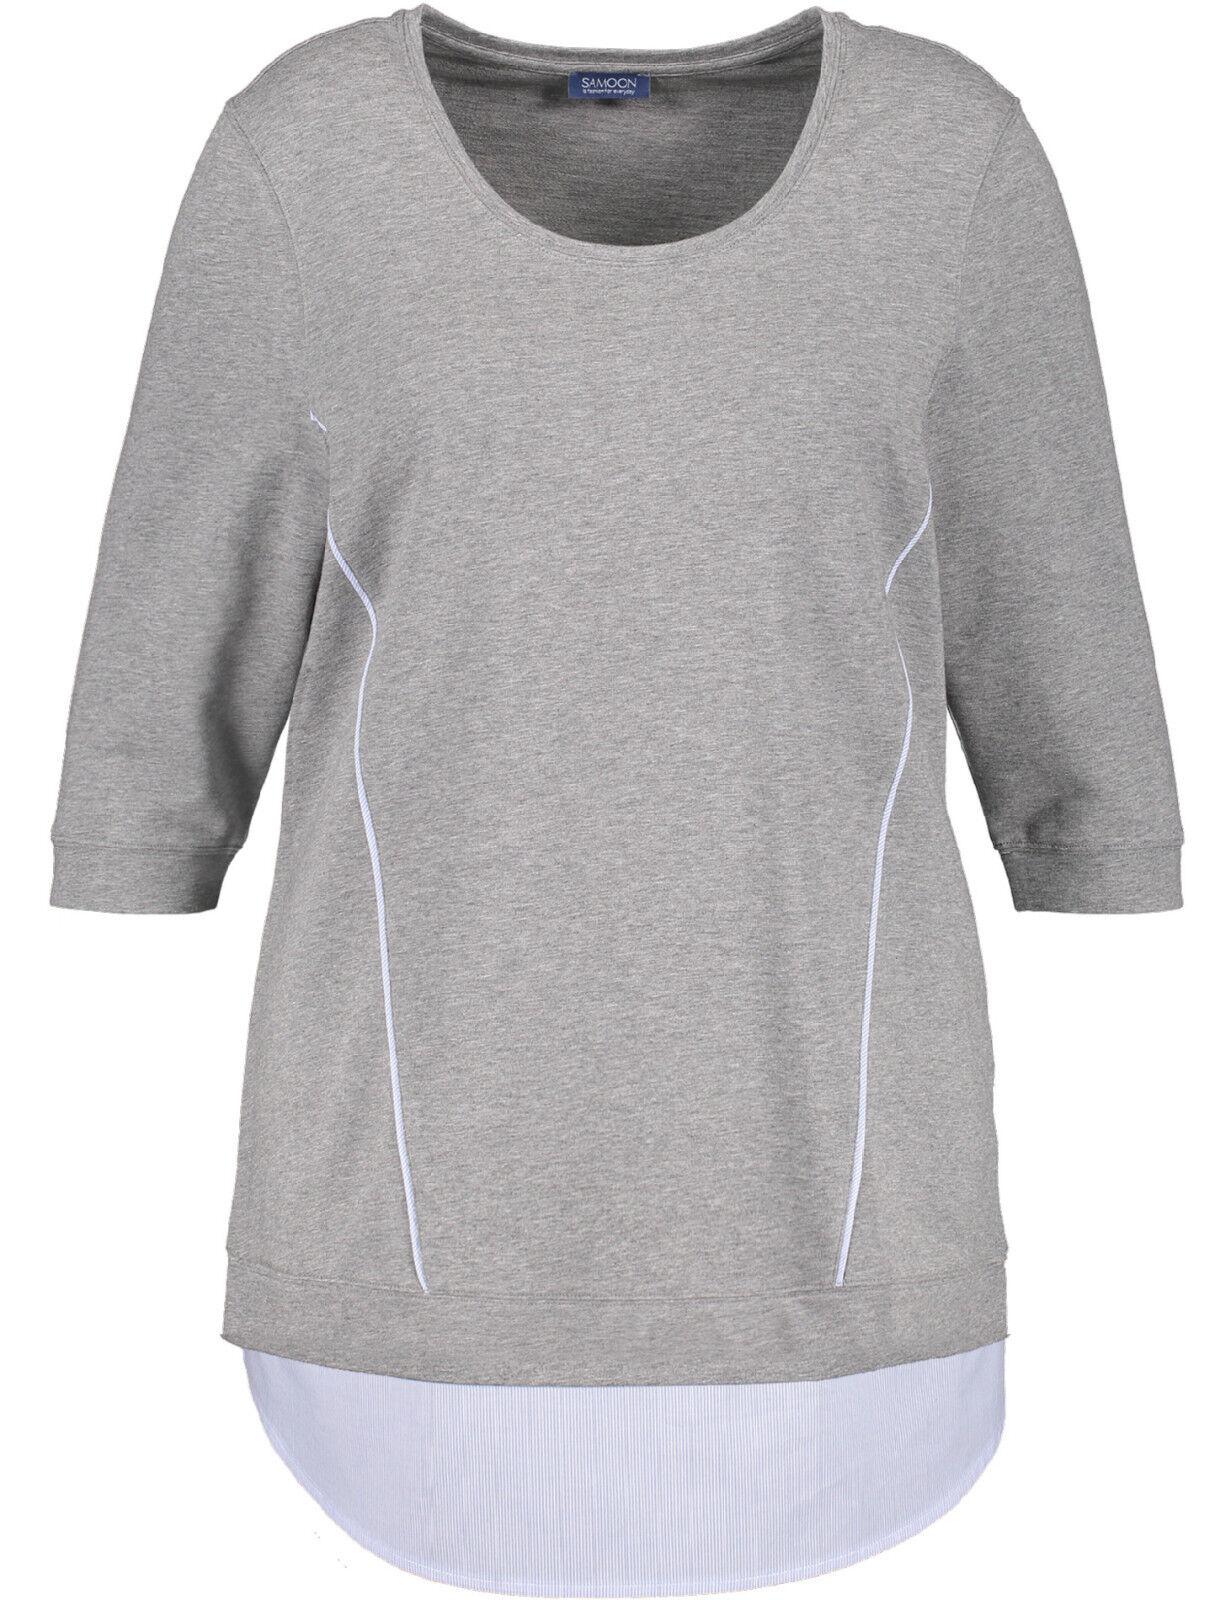 Samoon Langes Sweatshirt mit Blausen-Saum by Gerry Weber Neu Shirt Damen Gr.